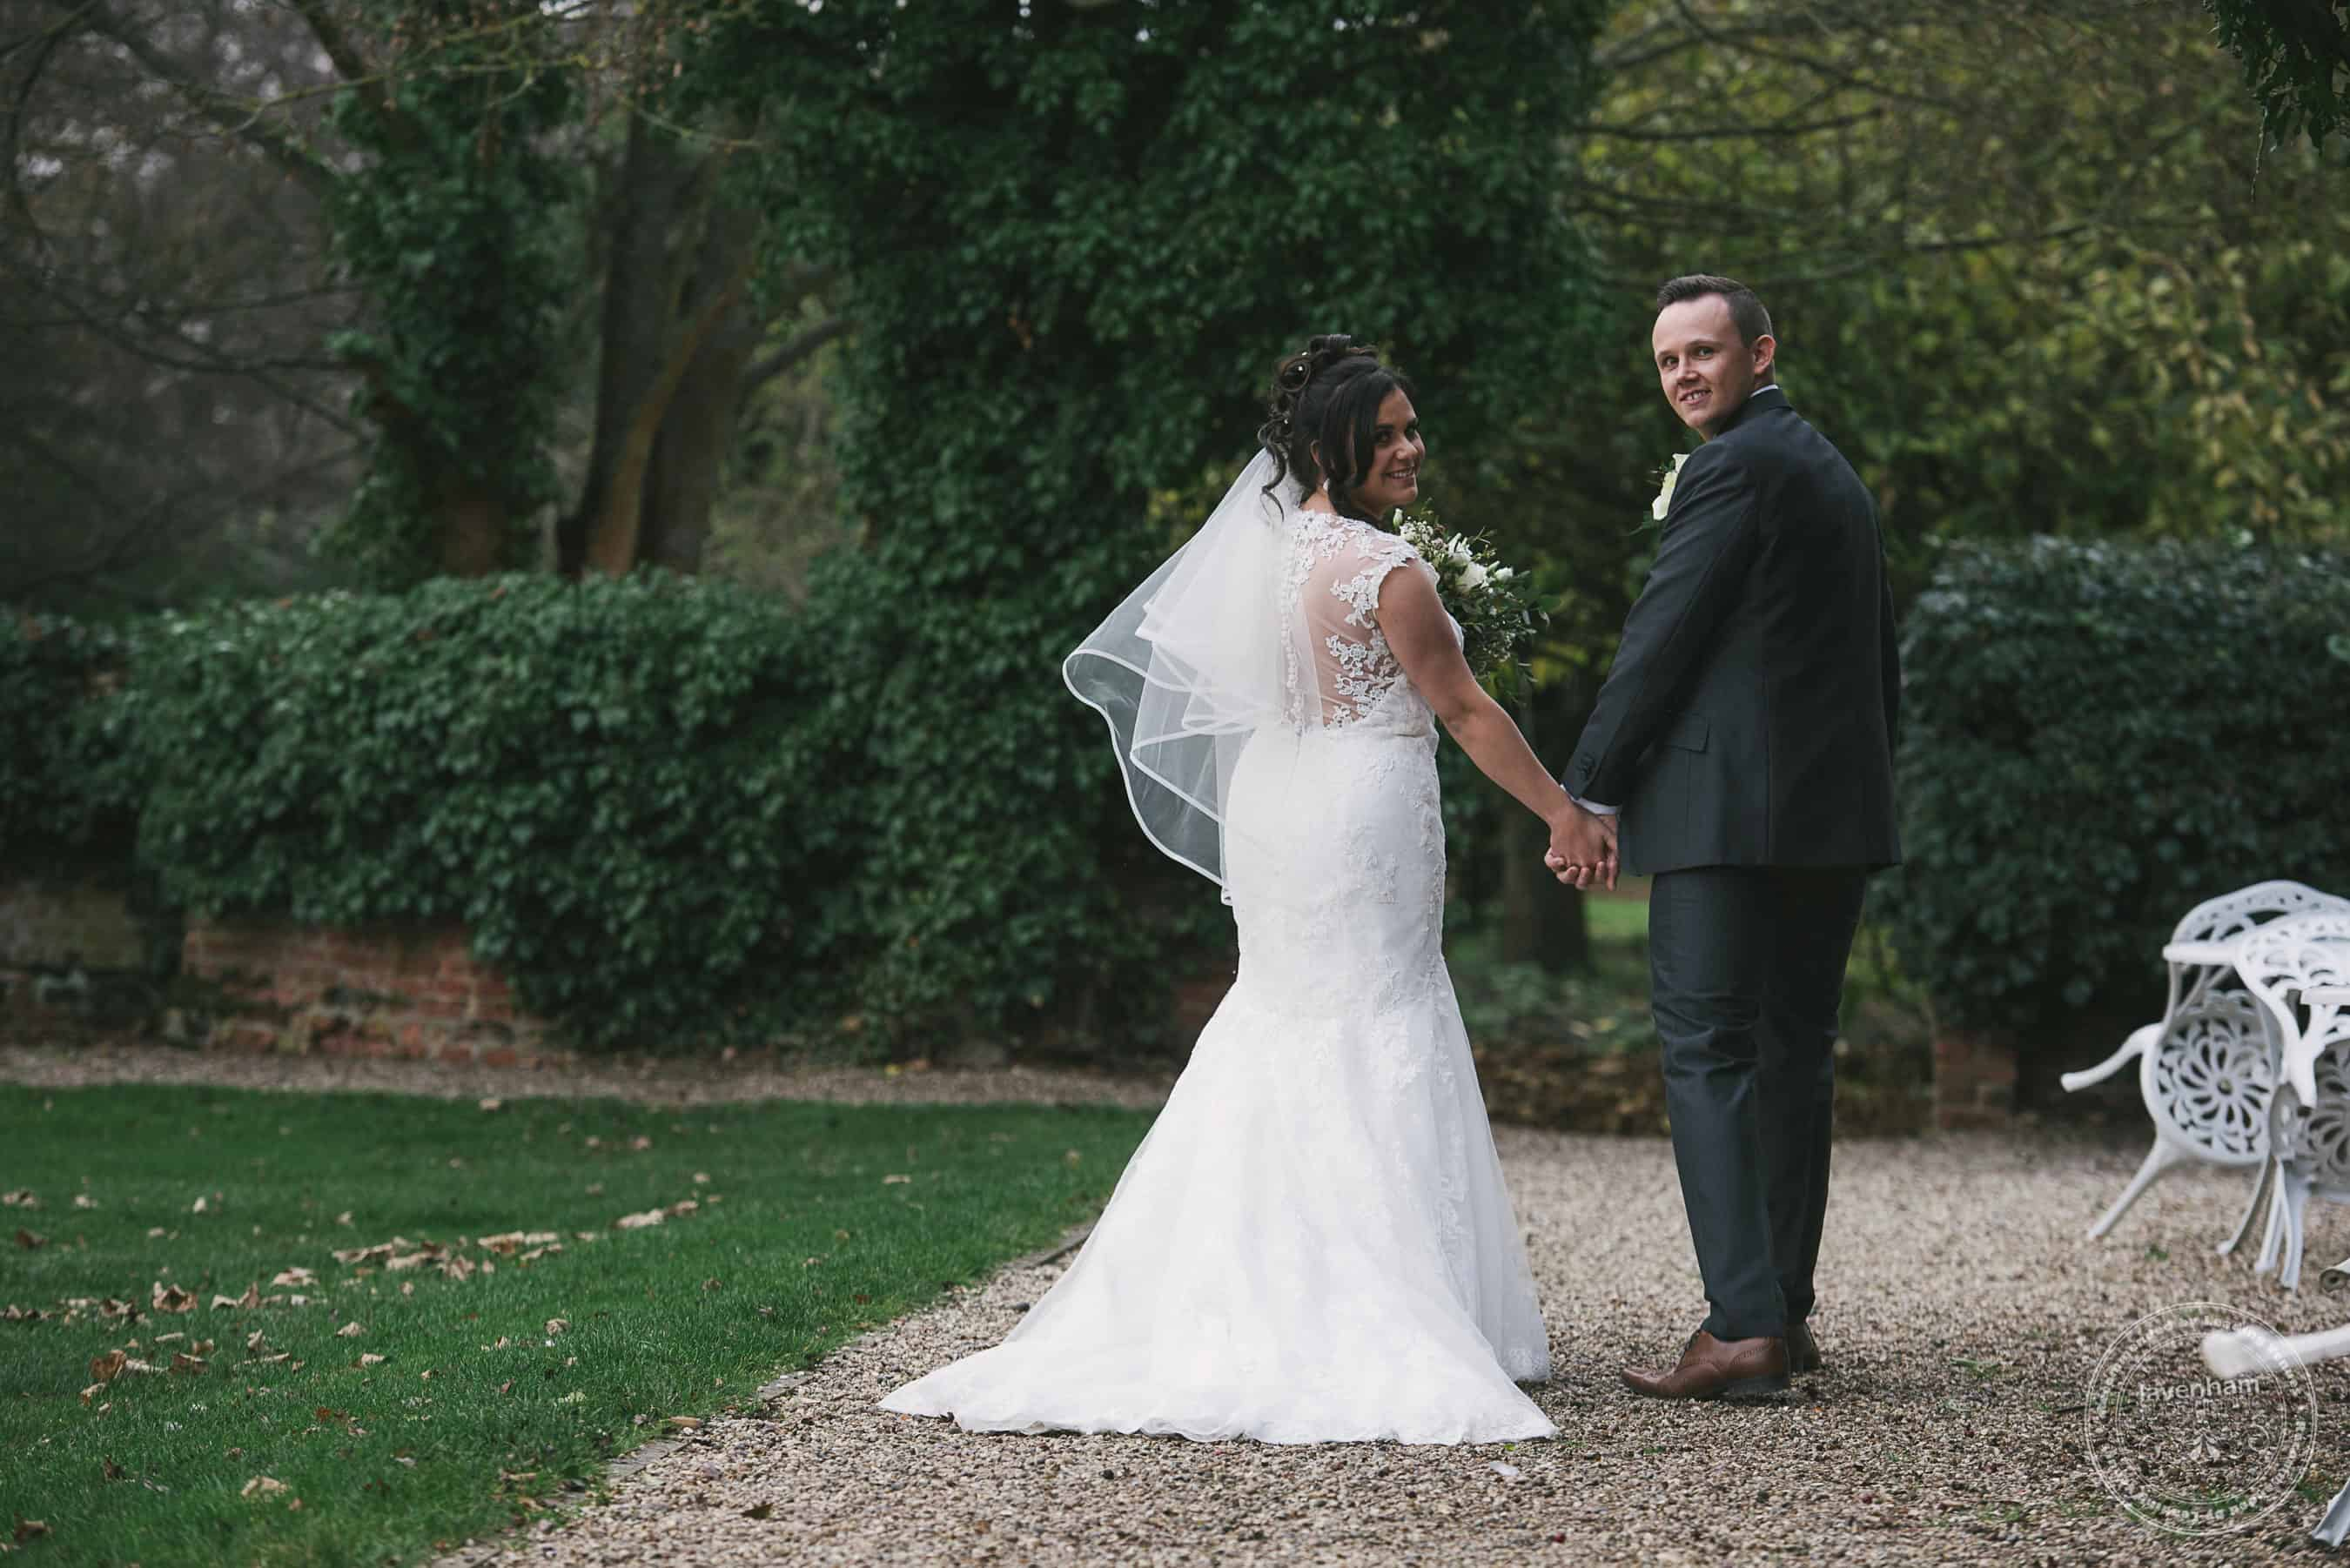 251118 Leez Priory Wedding Photography by Lavenham Photographic 078